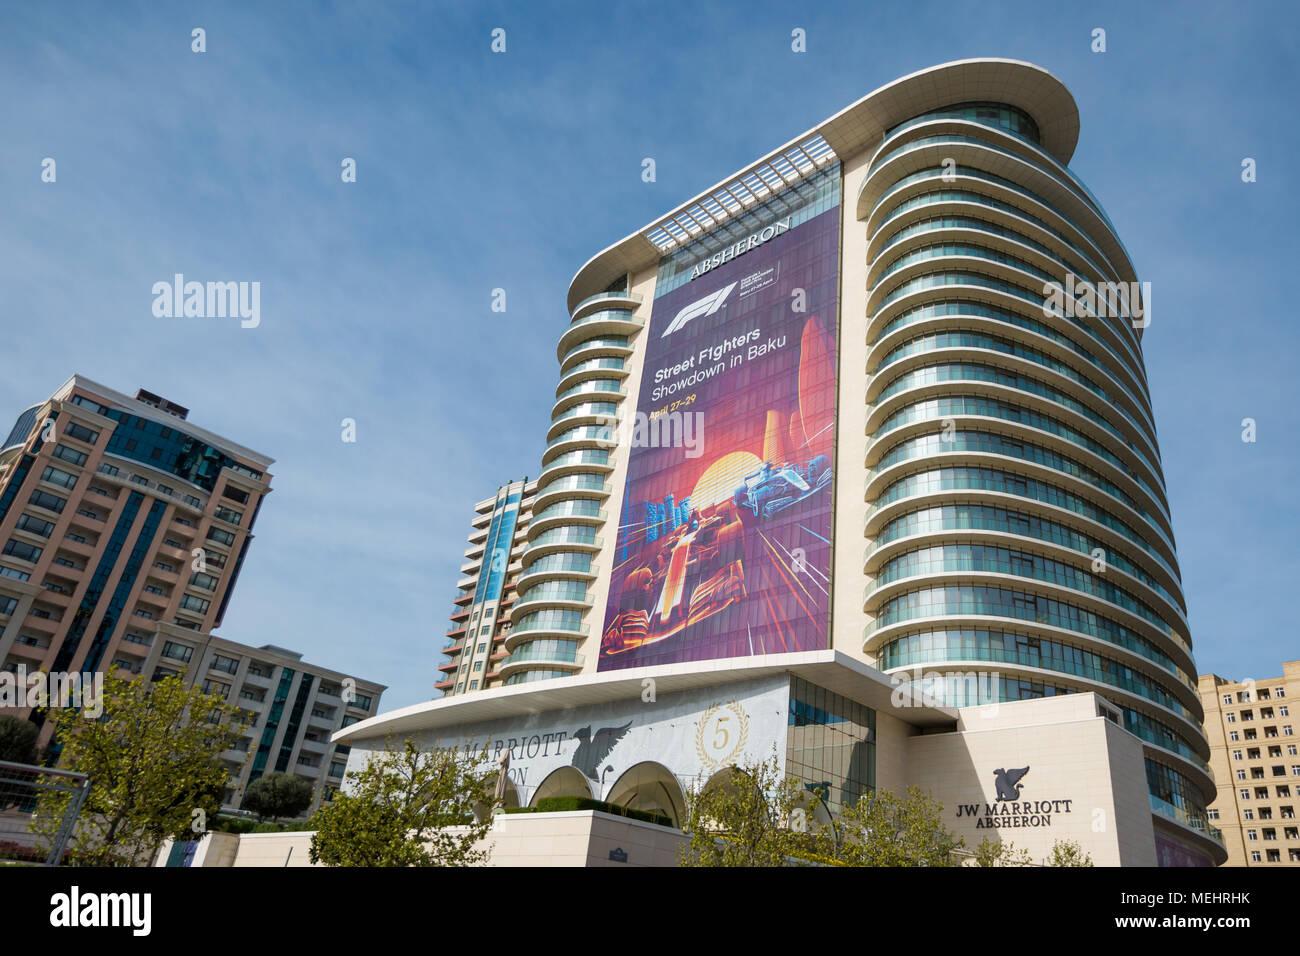 Baku datiert Standortbasierte Dating-Apps Android